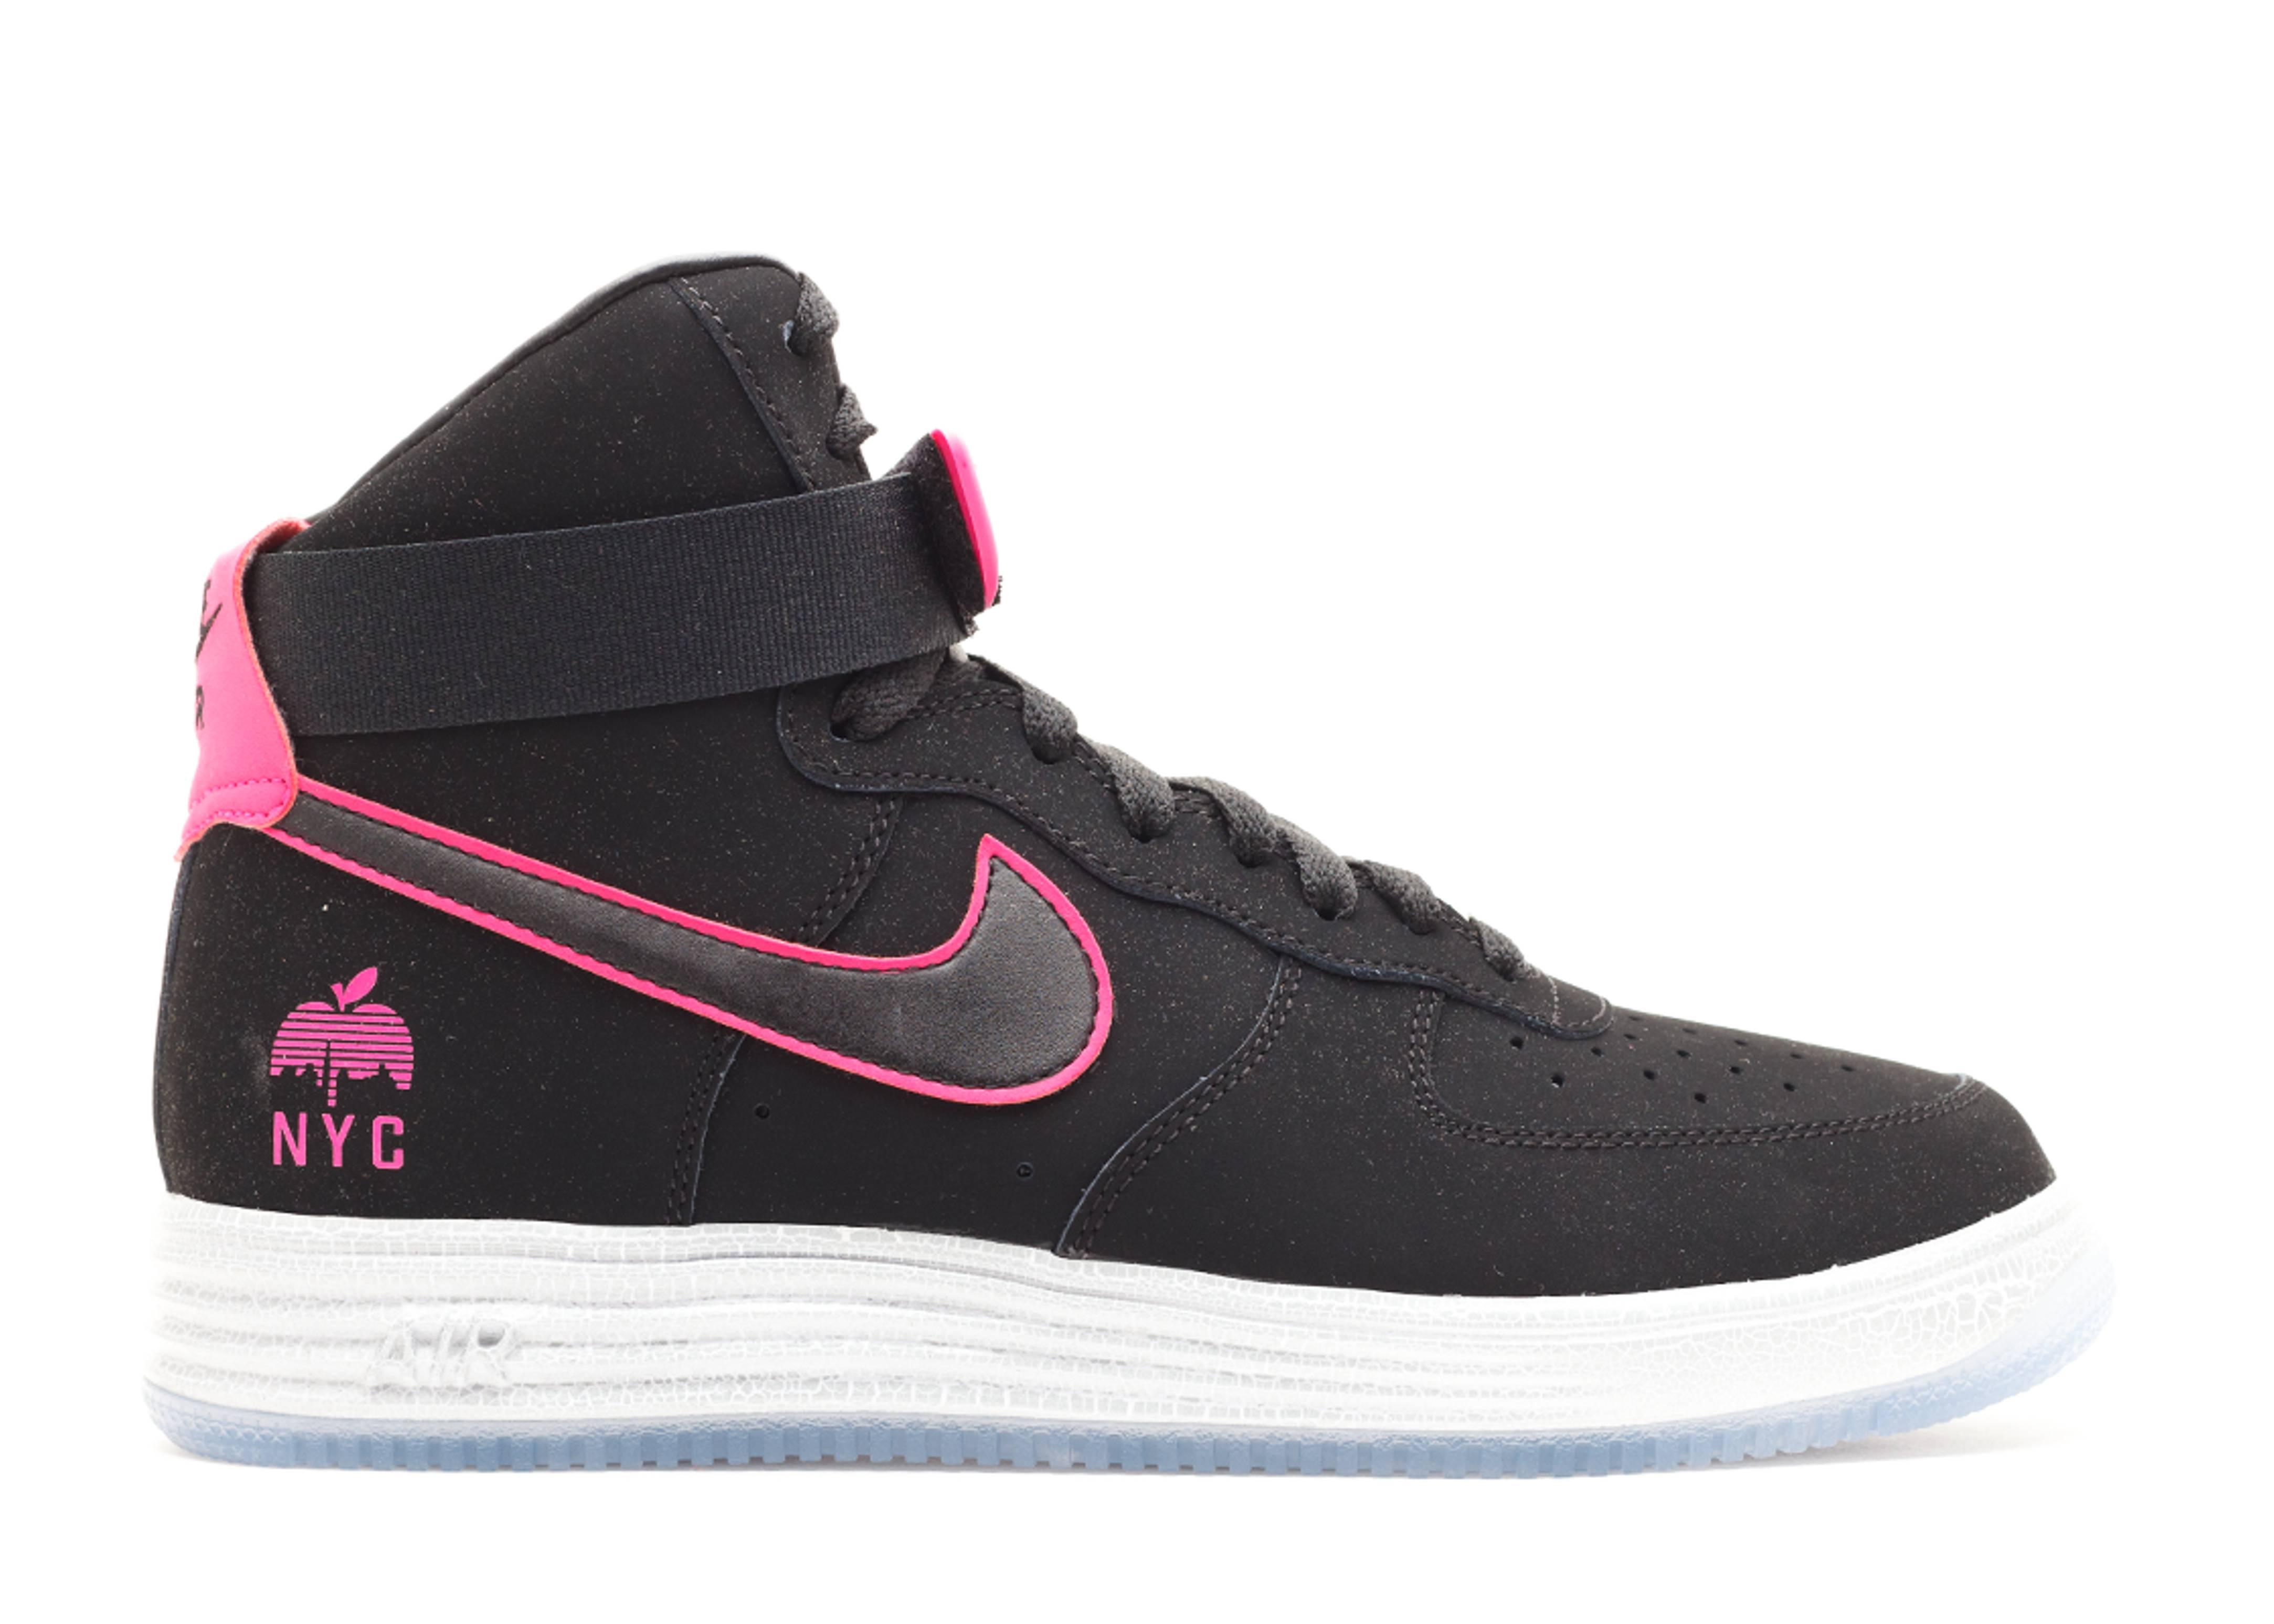 best sneakers 77436 d06f1 Lunar Force 1 Hyp Hi Qs